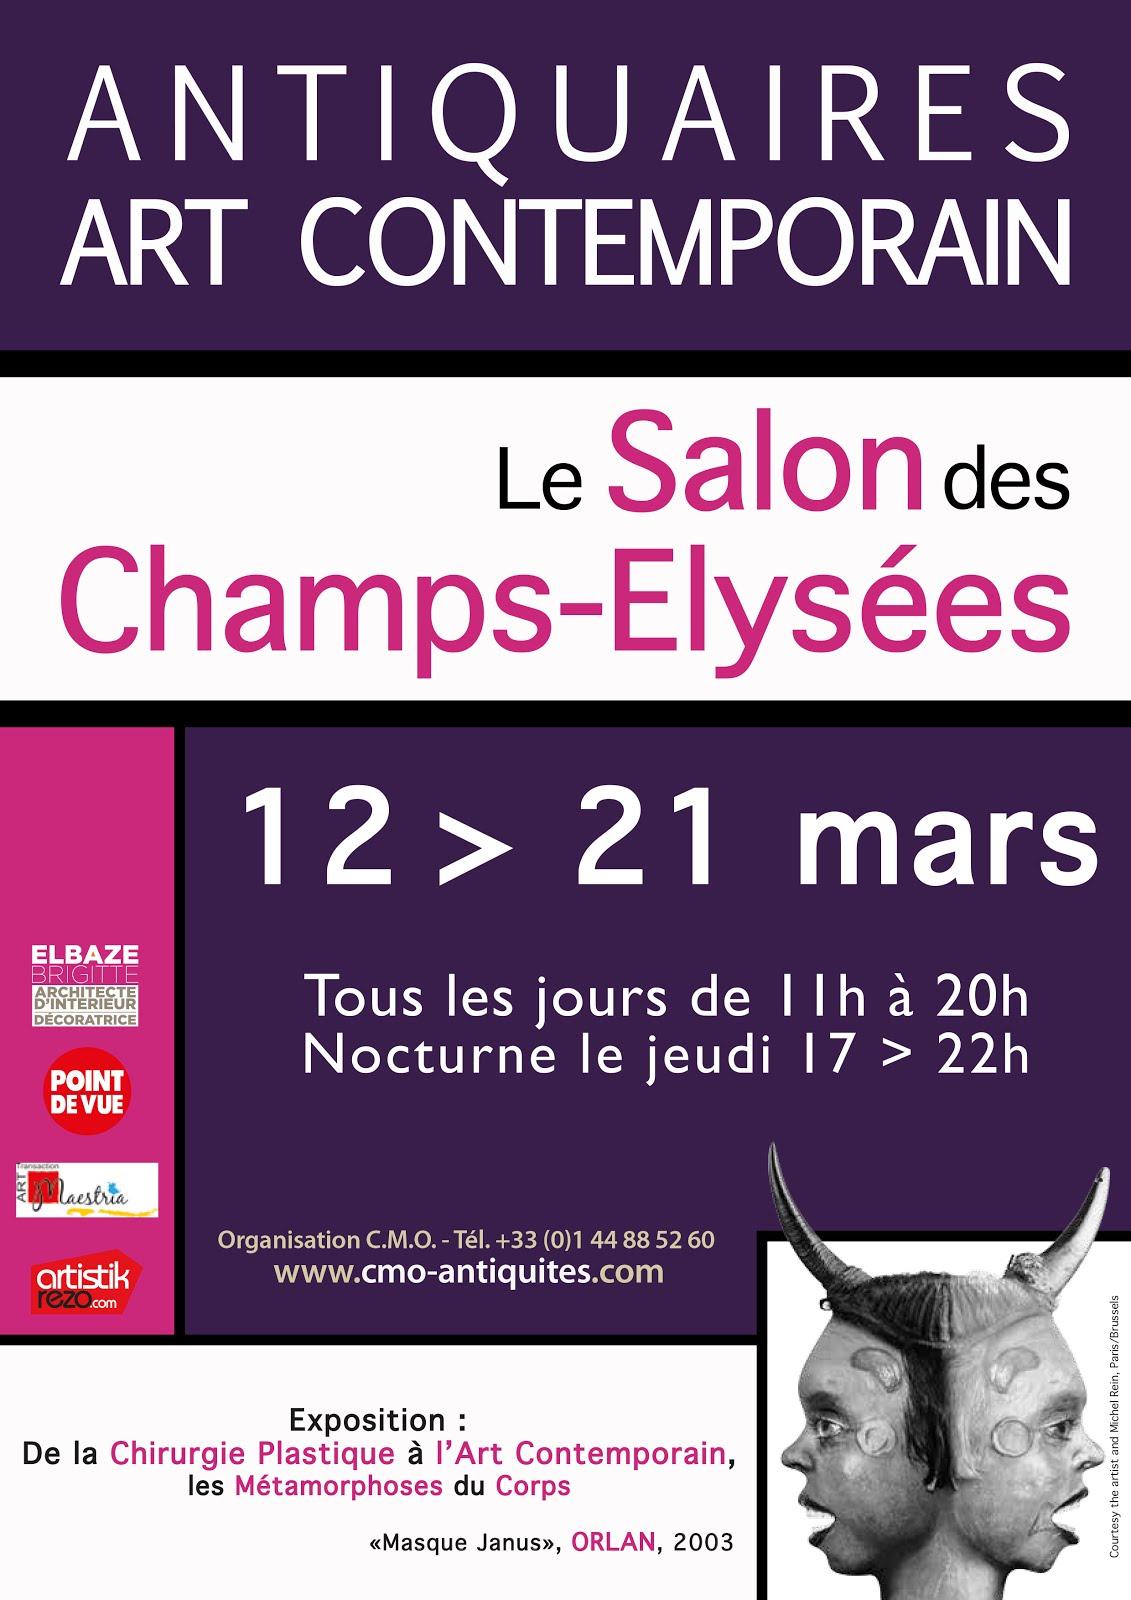 C a p t o n 2010 05 30 for Salon de coiffure afro champs elysees